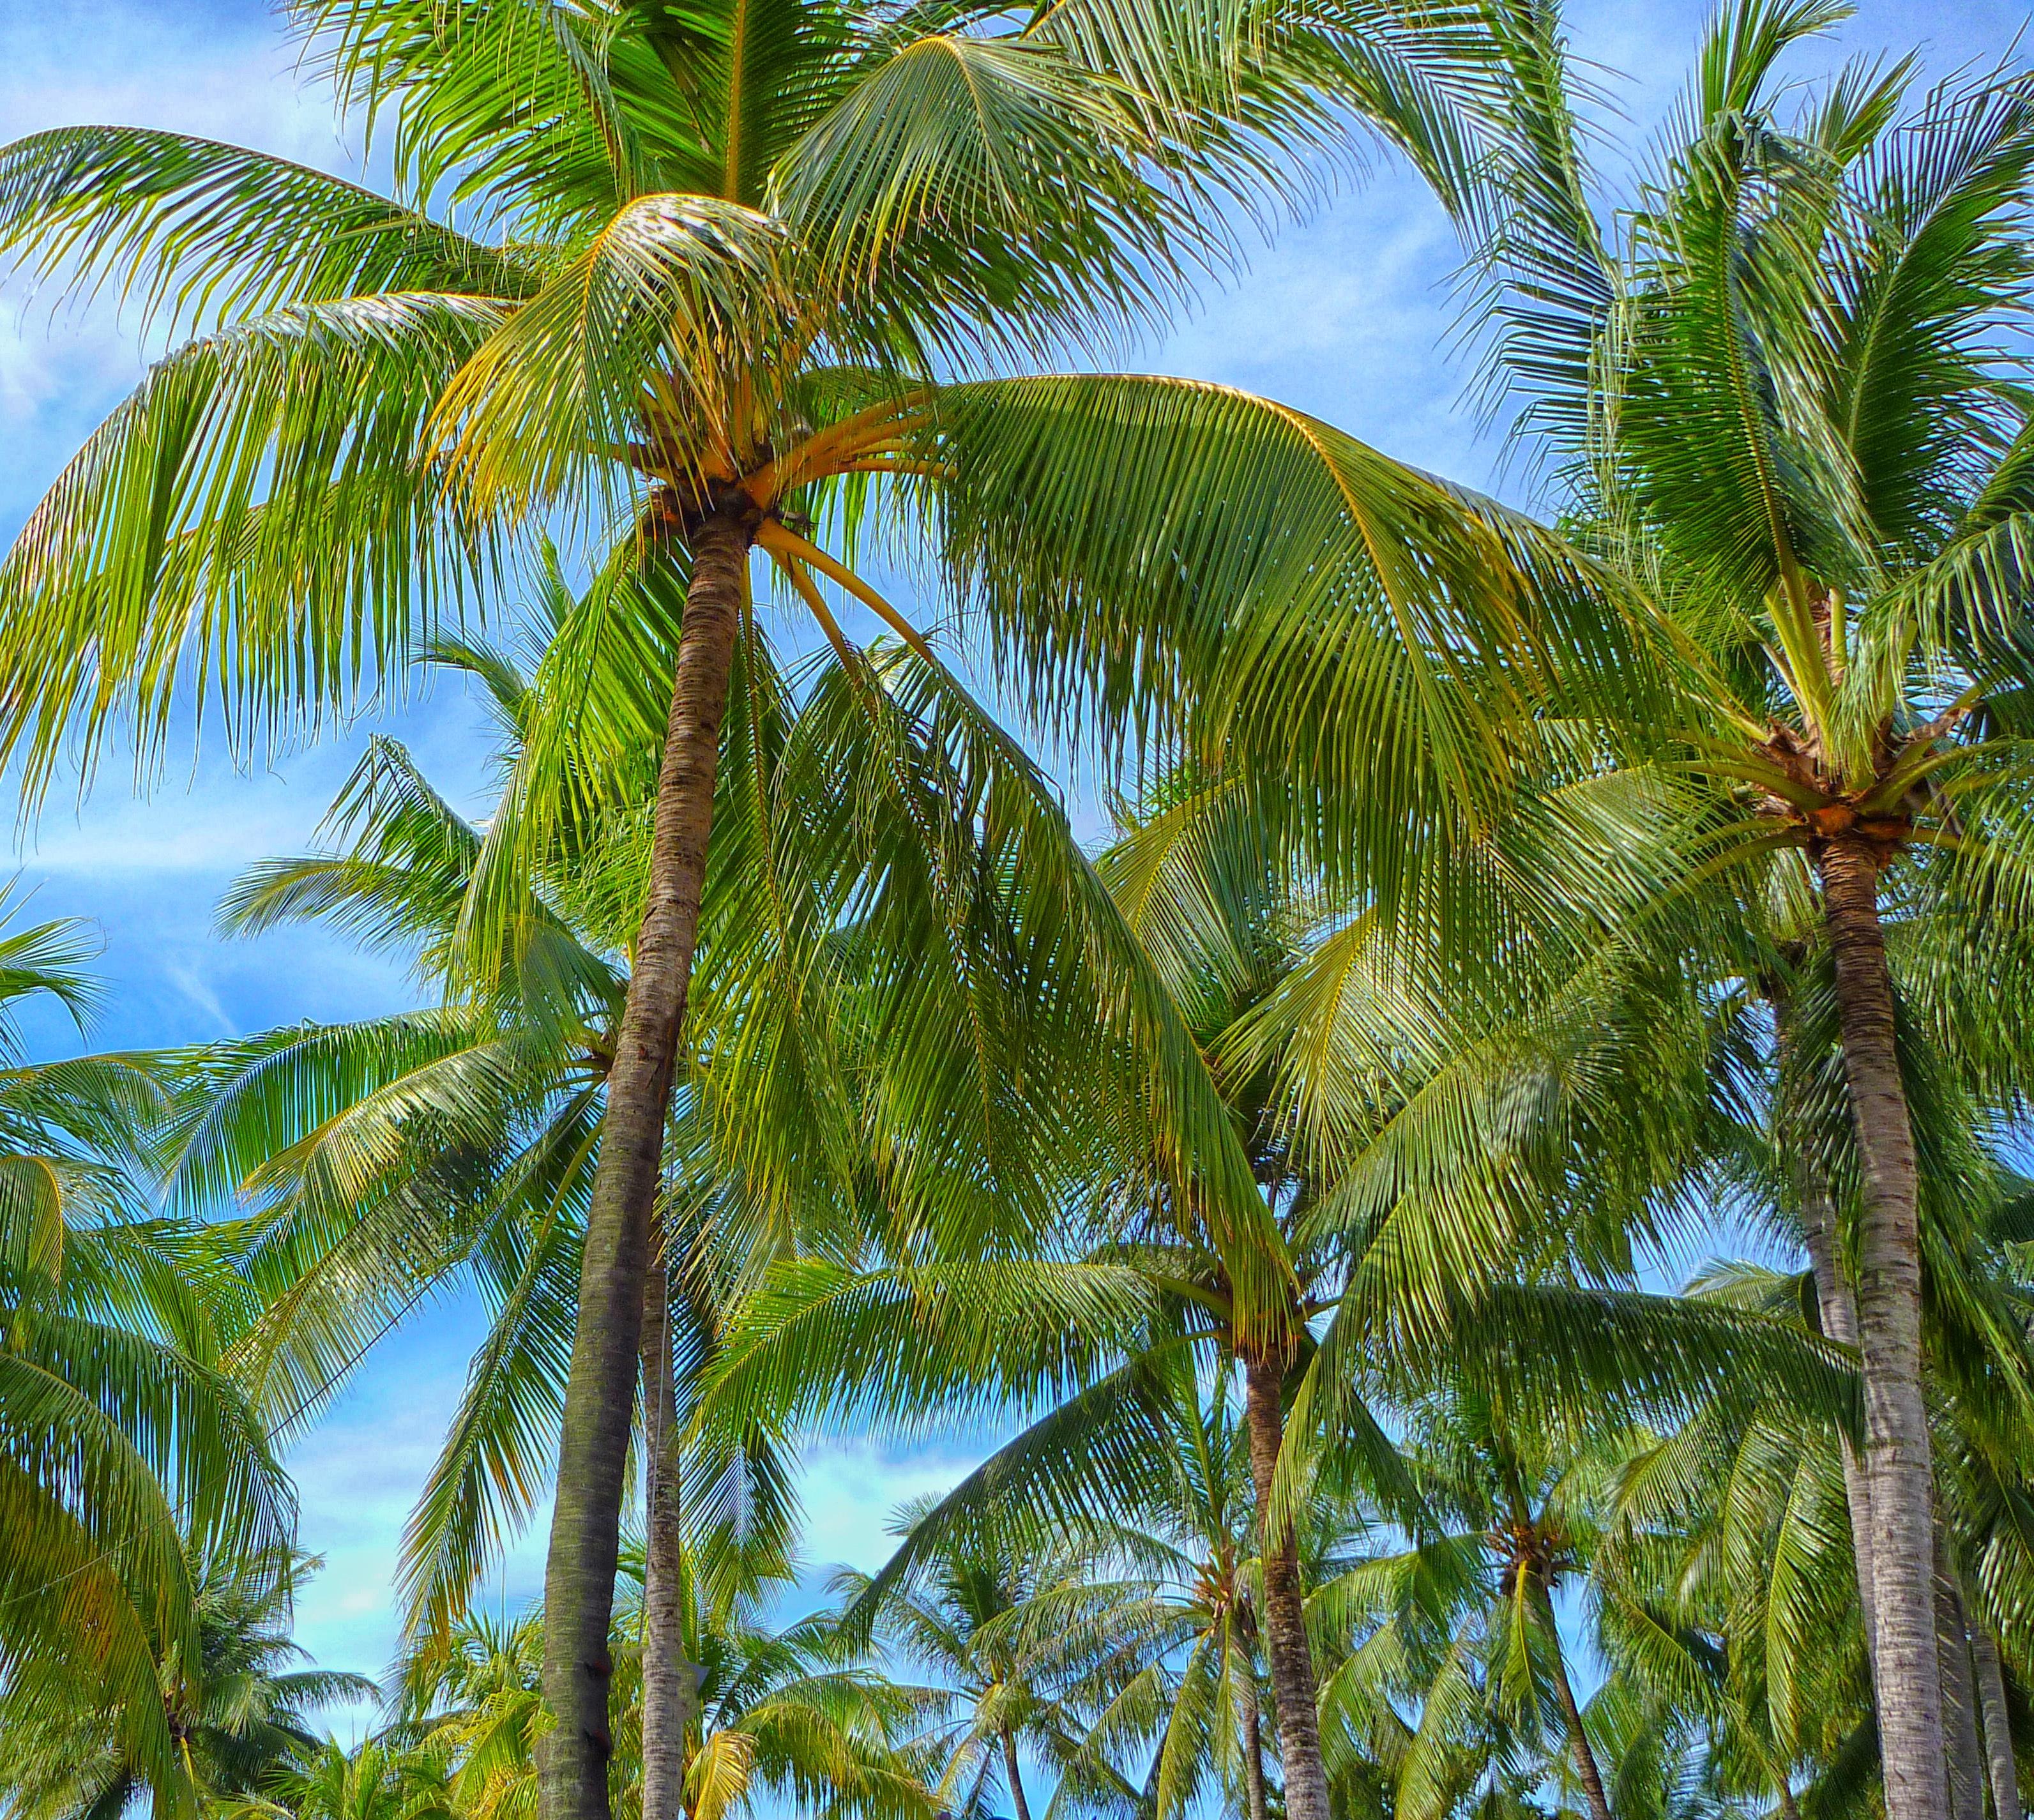 Free Images Outdoor Branch Palm Tree Flower Food Jungle Produce Tropical Island Botany Vegetation Rainforest Habitat Tropics Flowering Plant